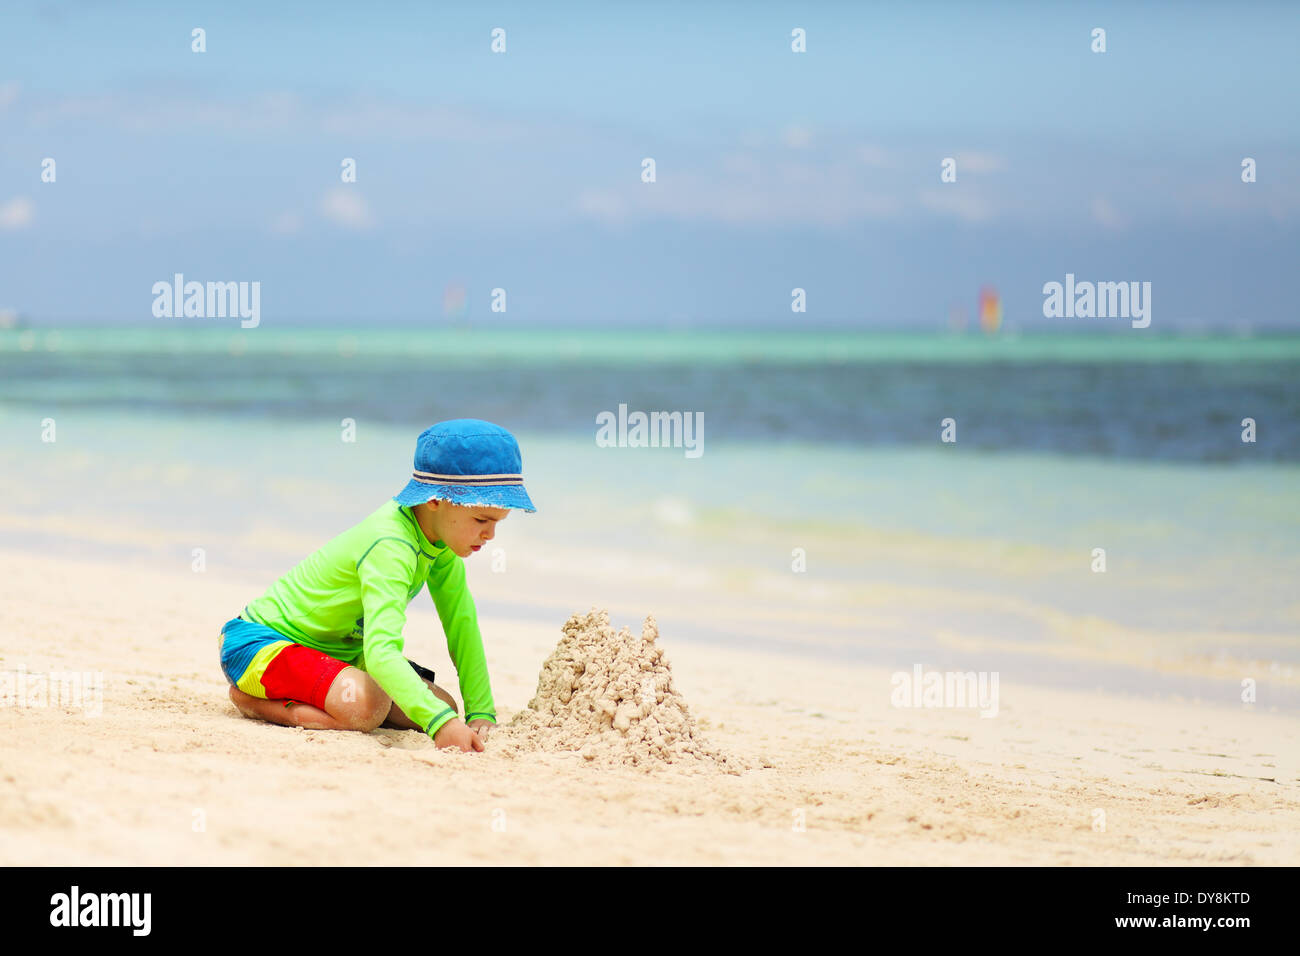 Caucasian boy building sand castle on tropical beach - Stock Image